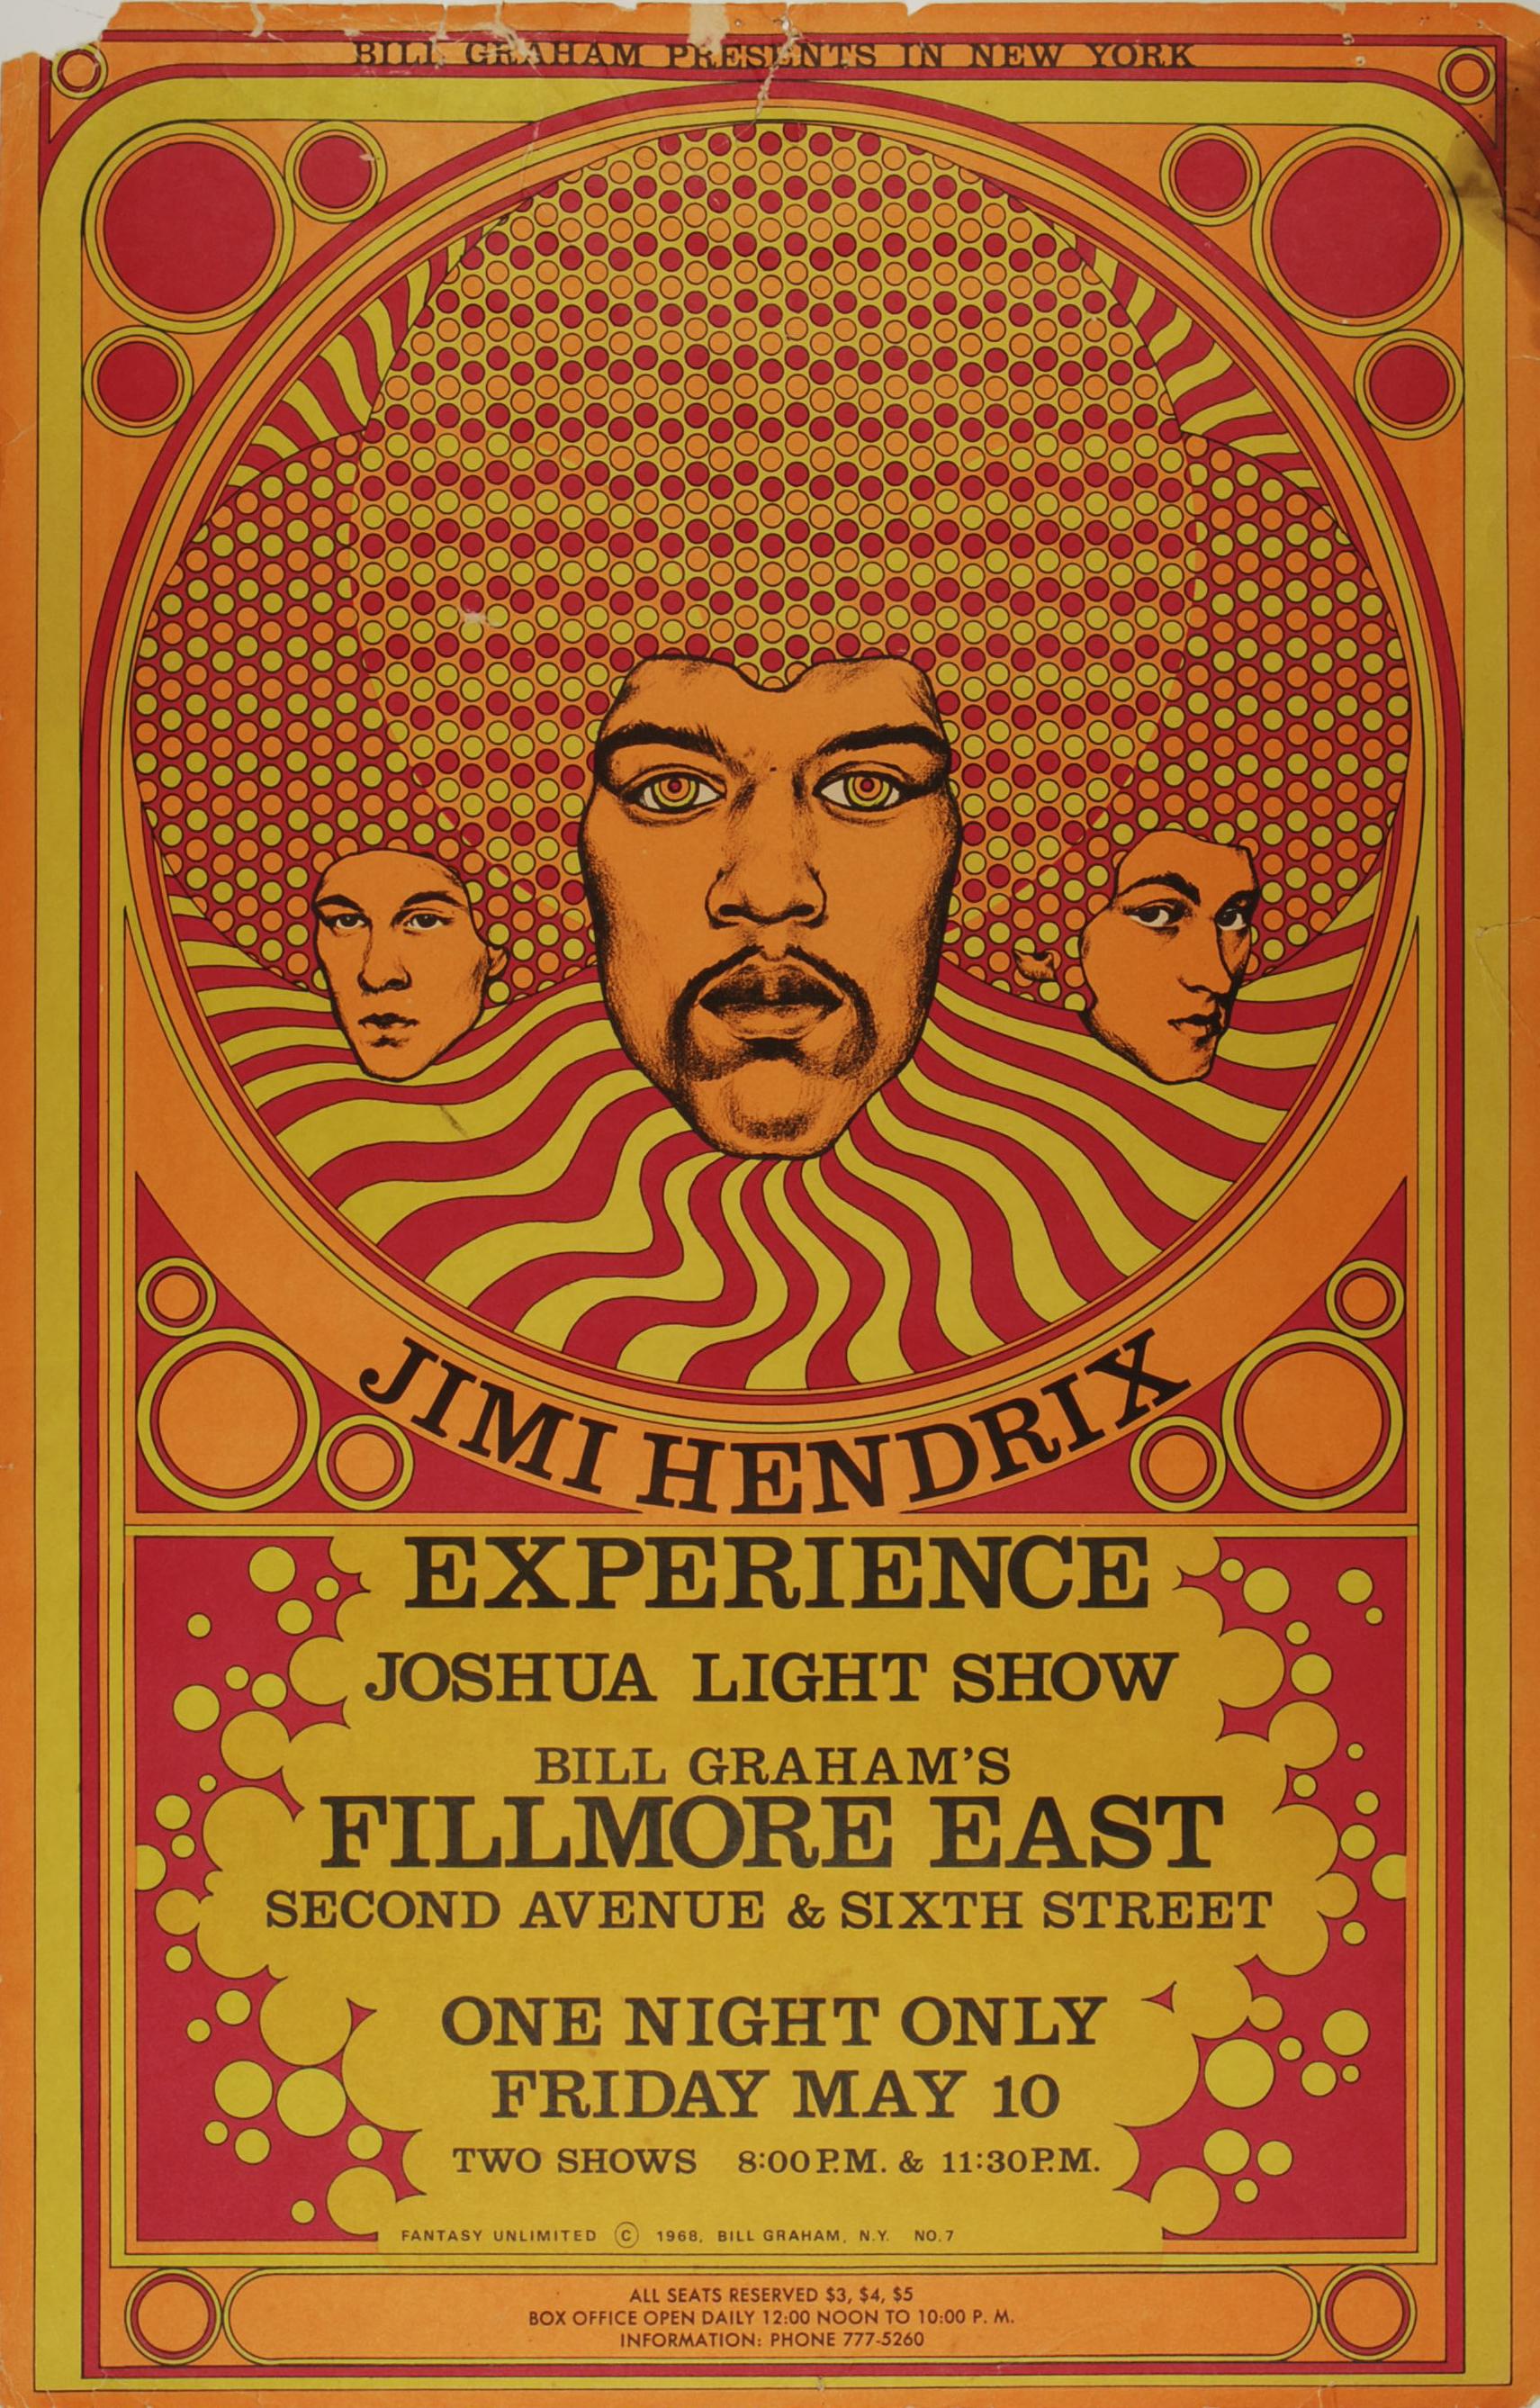 5_10_68_Jimi Hendrix_Fillmore East.jpg